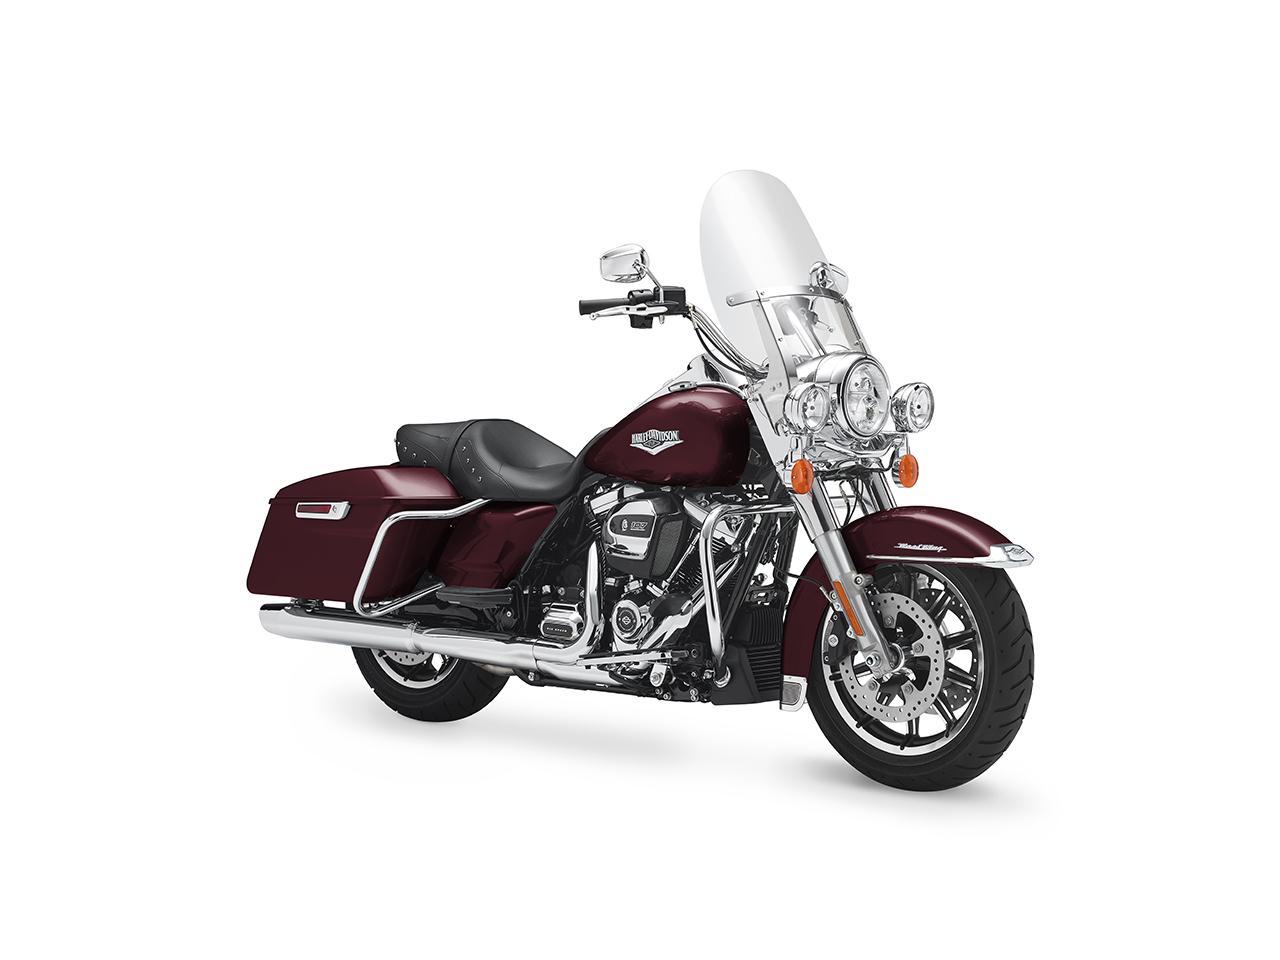 2018 Harley-Davidson Road King Image